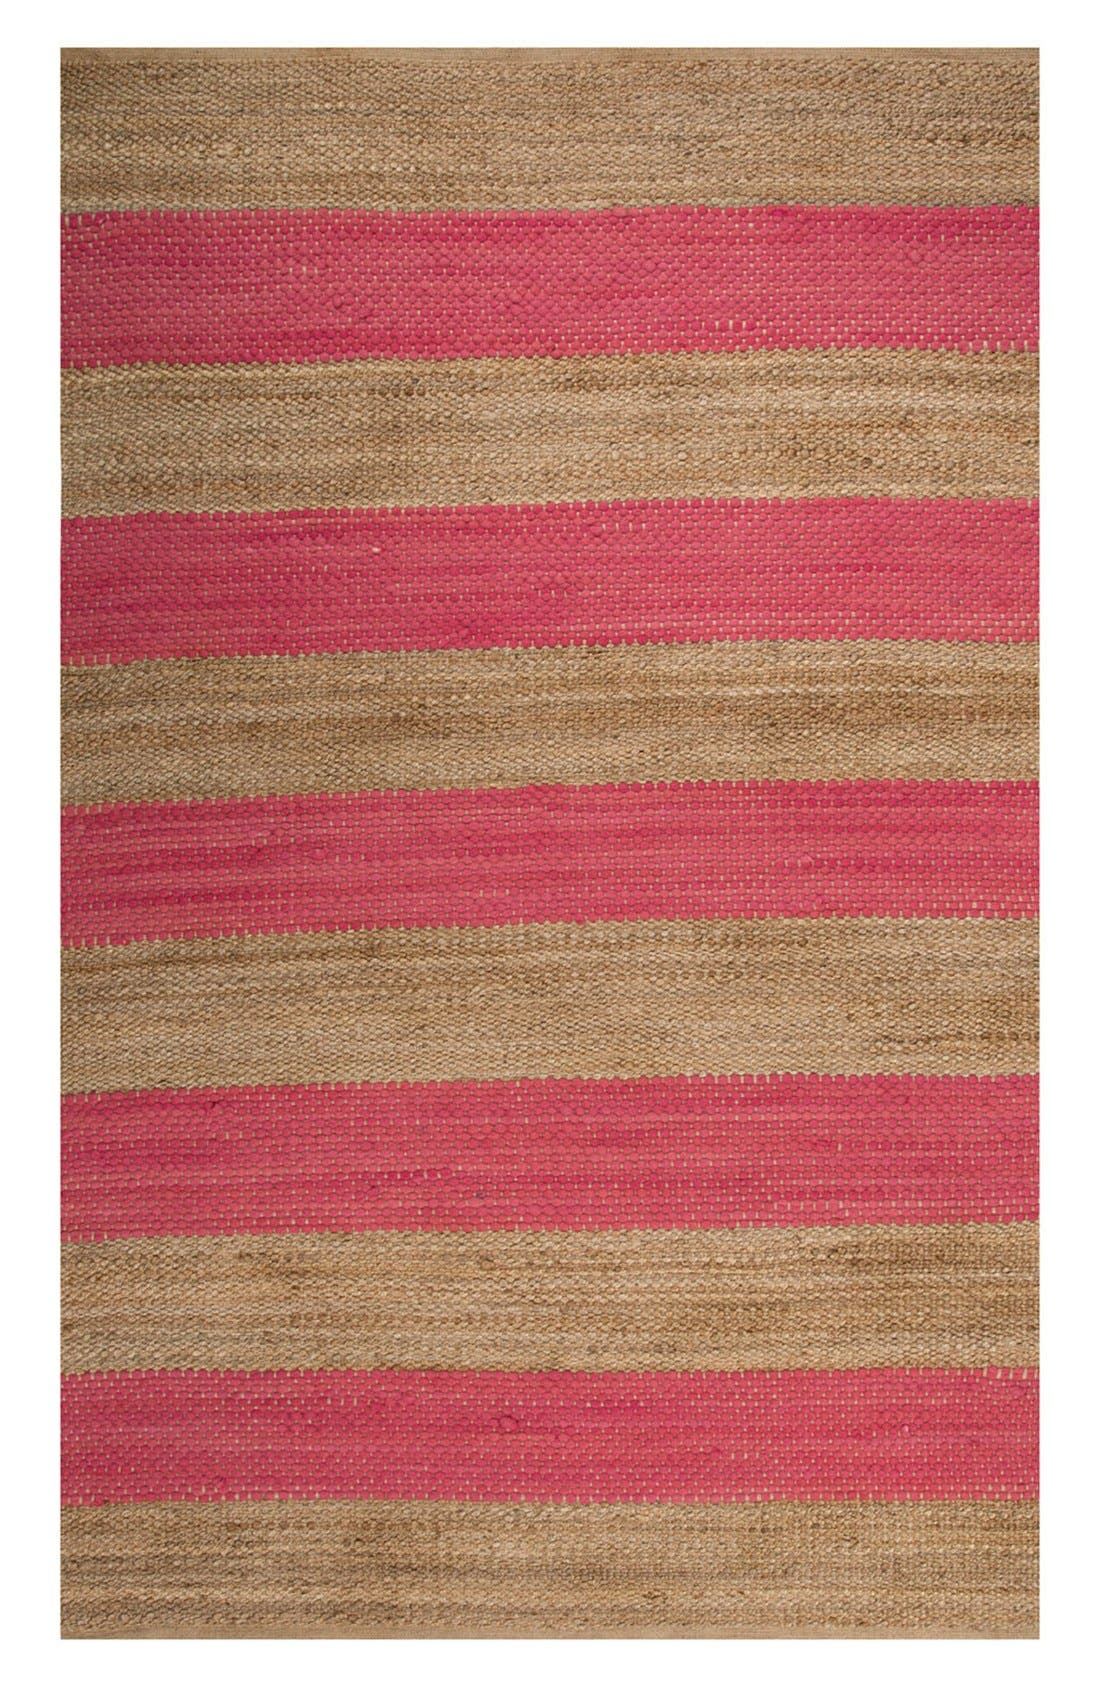 Alternate Image 1 Selected - kate spade new york 'nolita stripes' rug